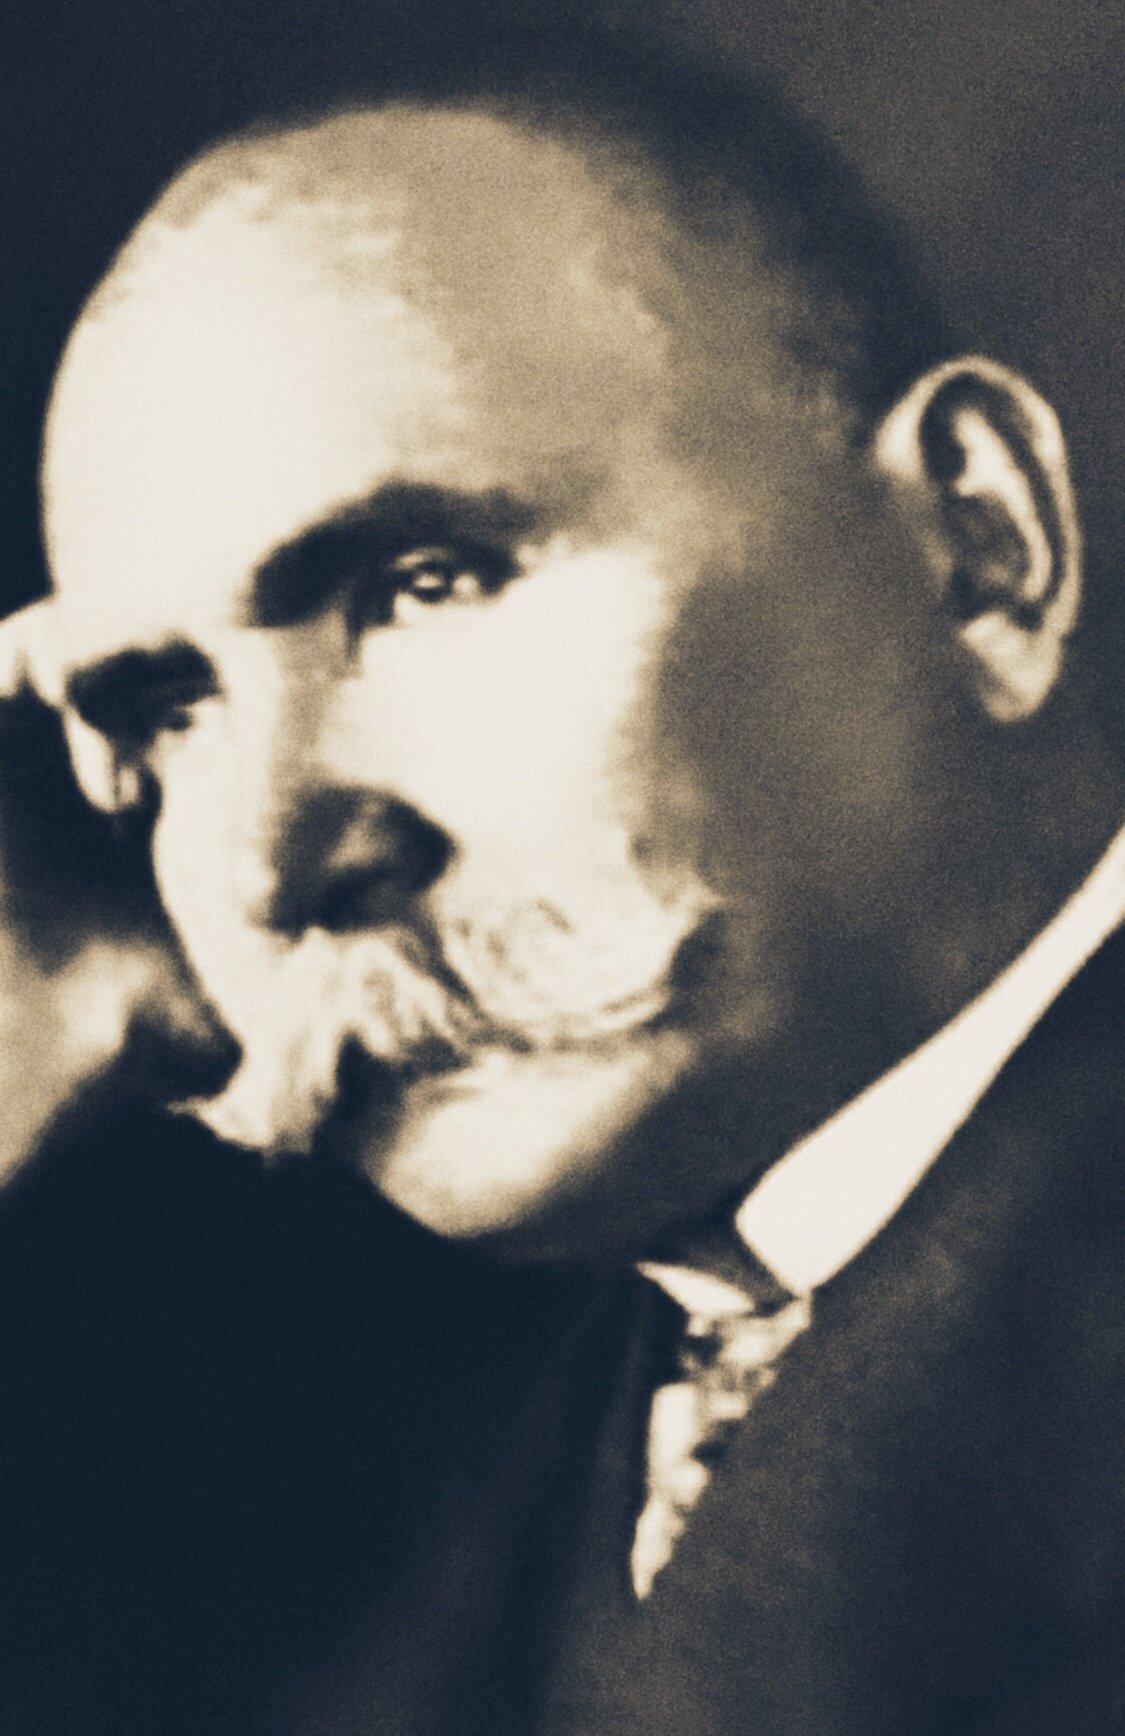 Узуновић, фото: Википедија